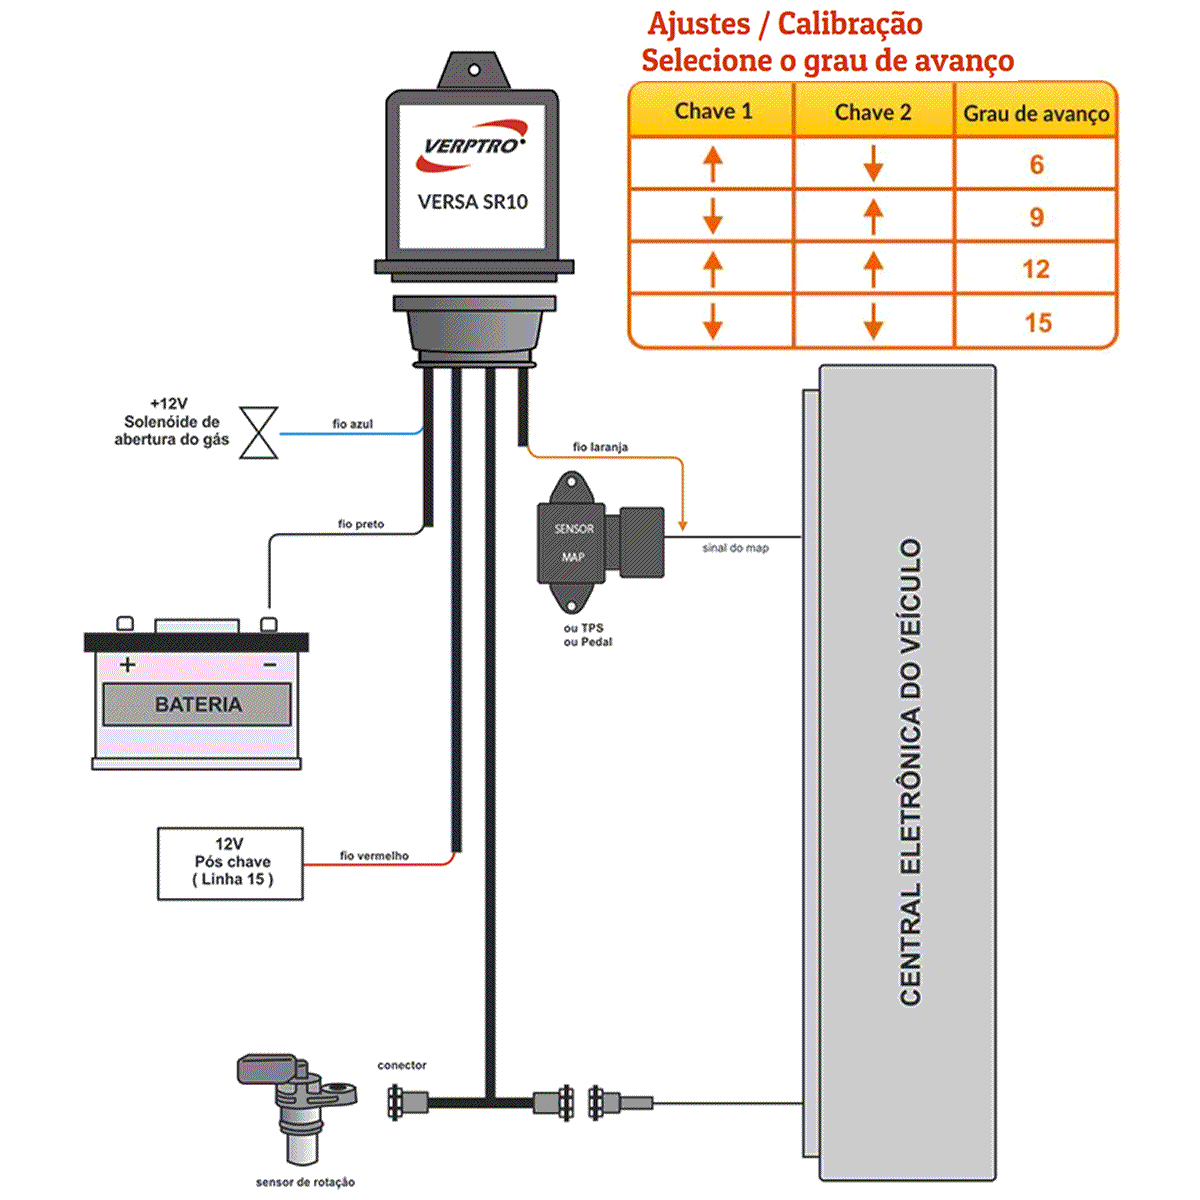 Variador de Avanço Roda Fônica Versa SR10 cabo B VERPTRO Ford